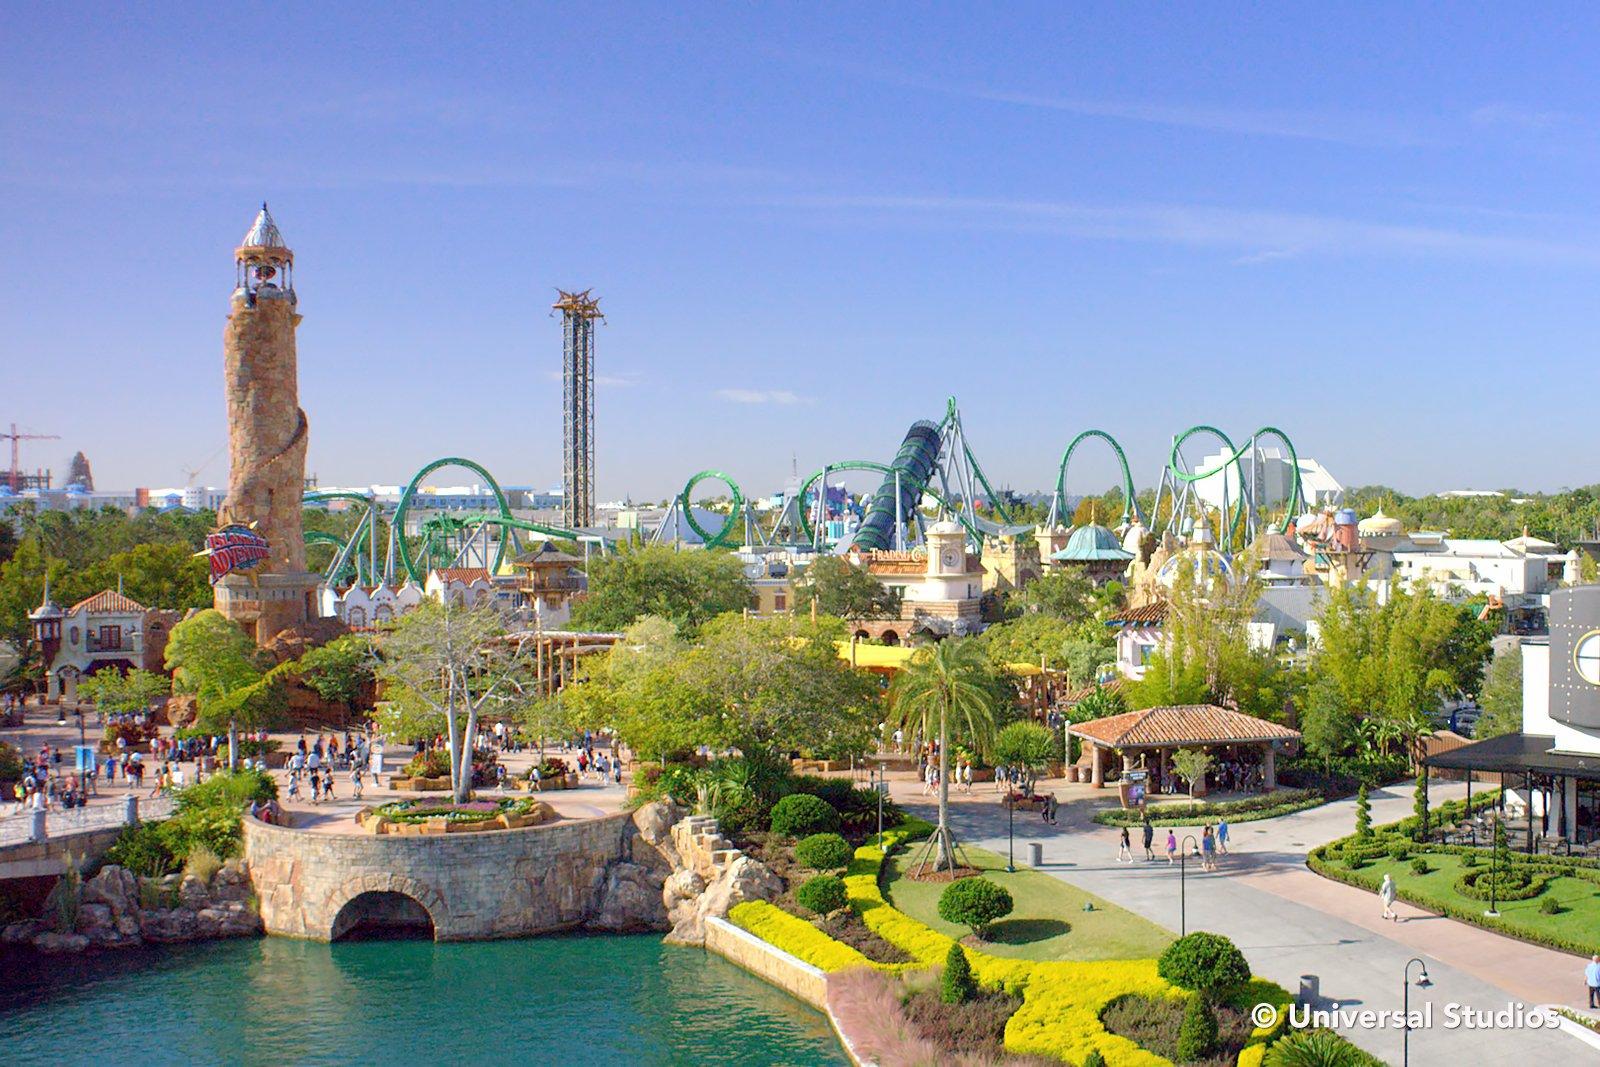 10 Best Theme Parks in Orlando - Orlando Theme Parks California Theme Parks Map on